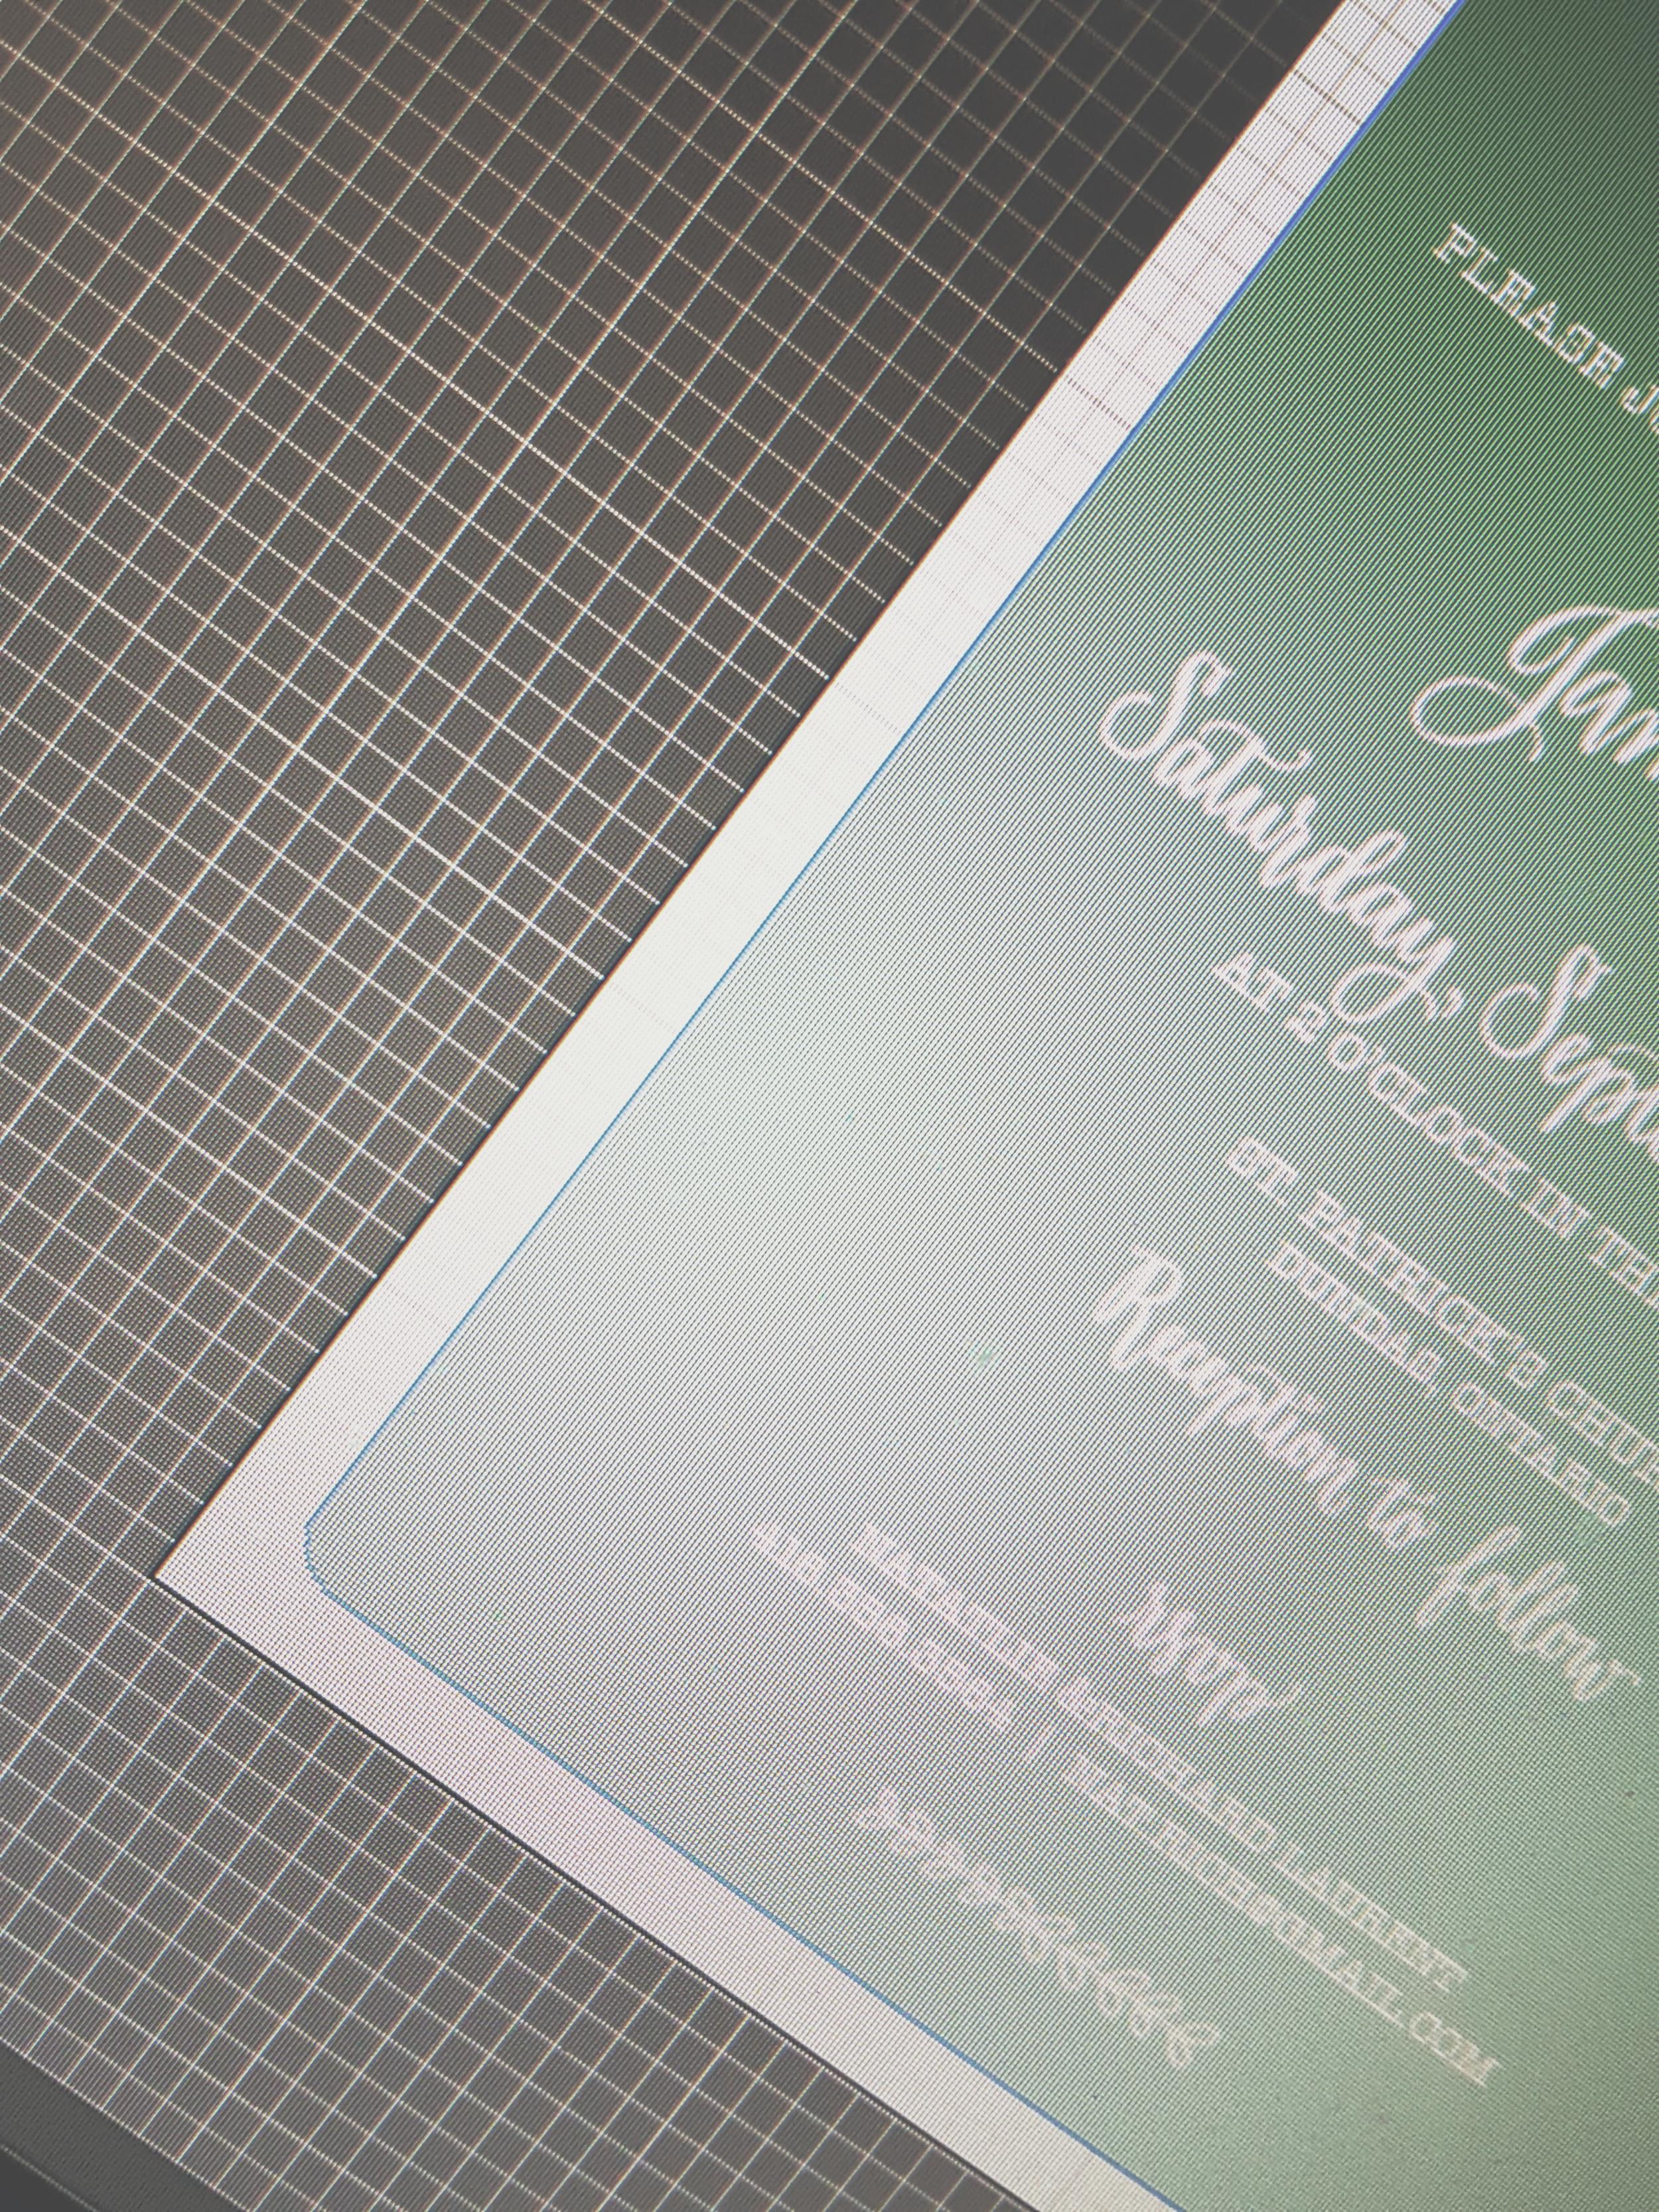 Sneak Peek! New invitation designs